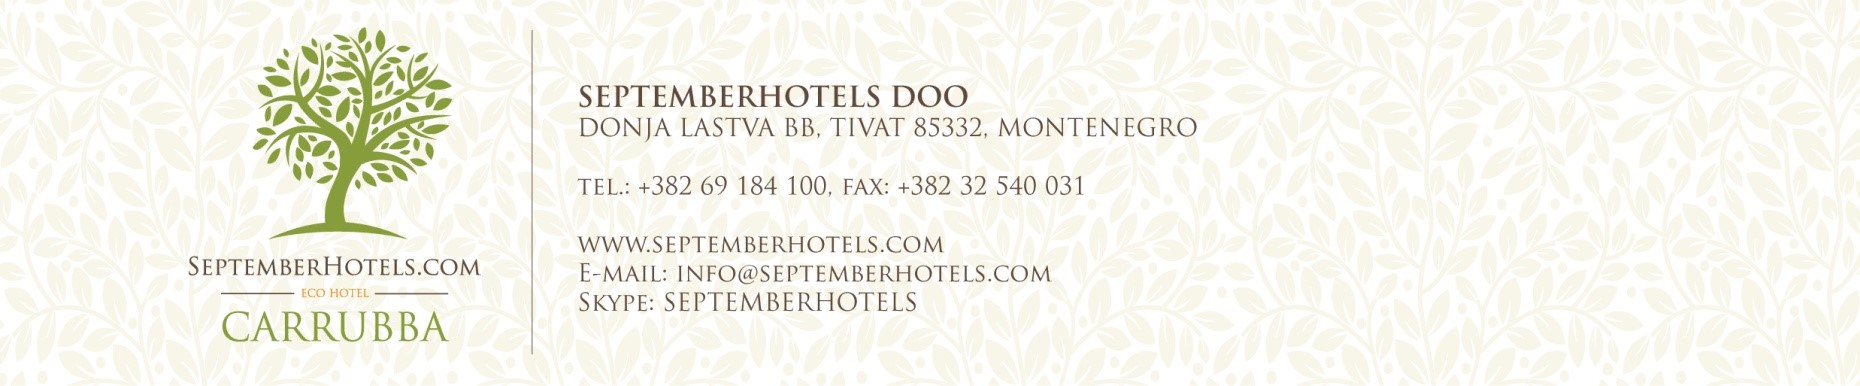 Environmental Care Declaration September Hotels